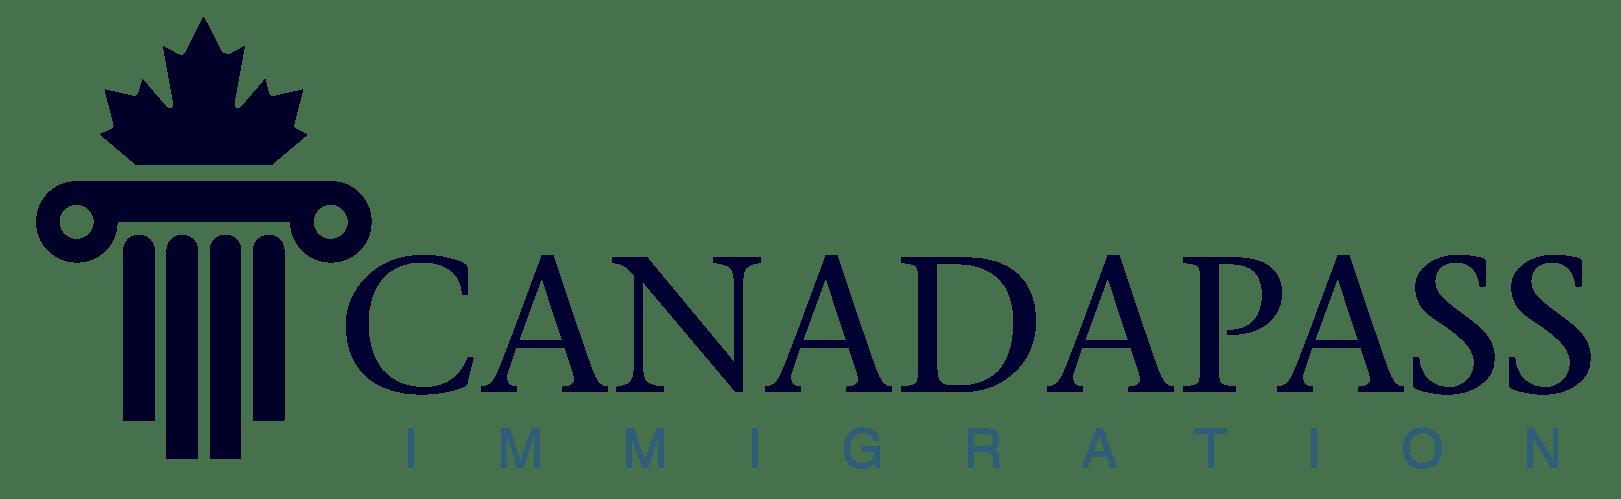 Canadapass